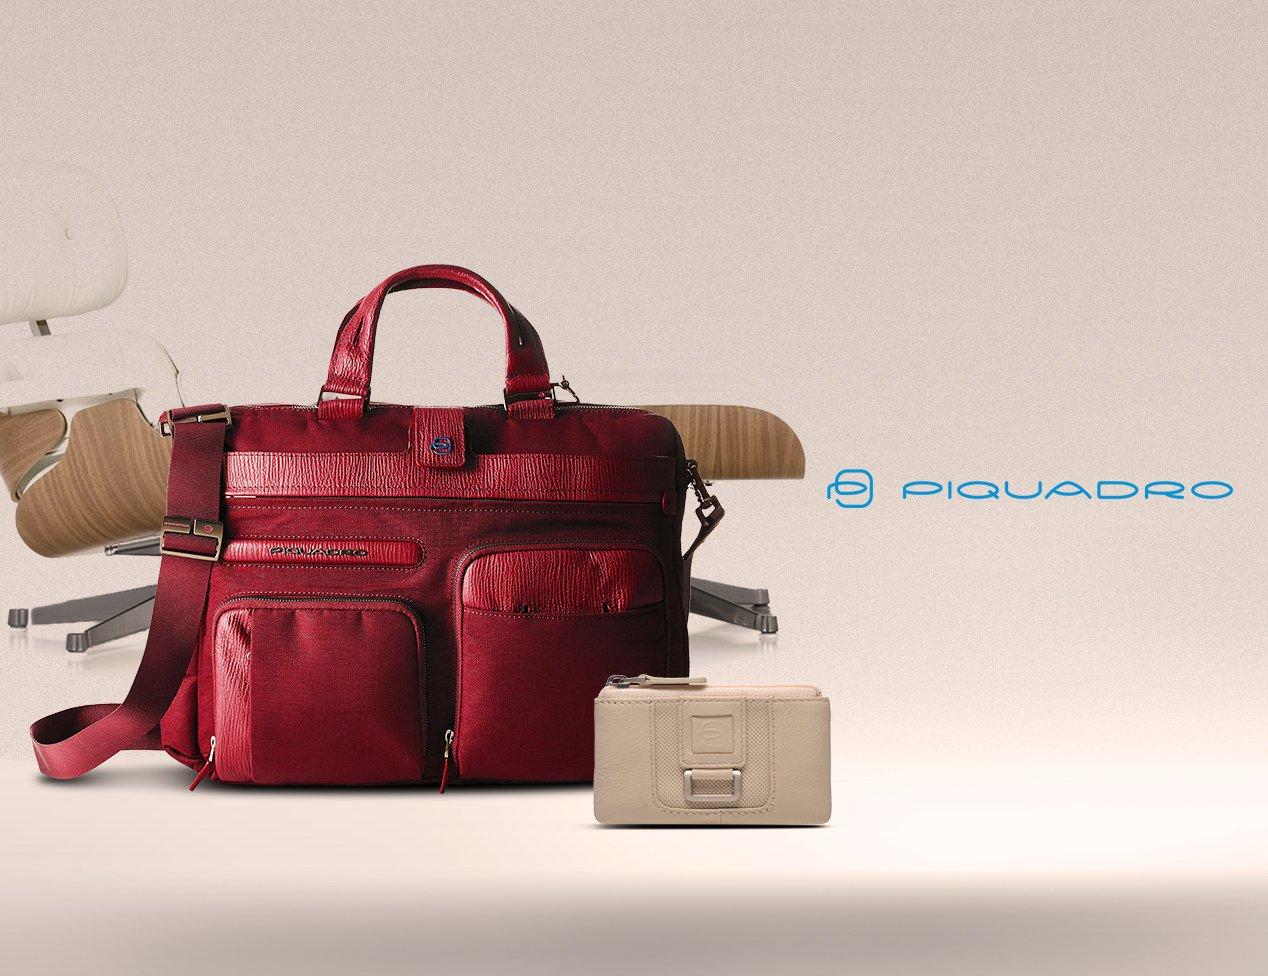 Amazon buy vip piquadro royal red colors nebulus for Piquadro amazon